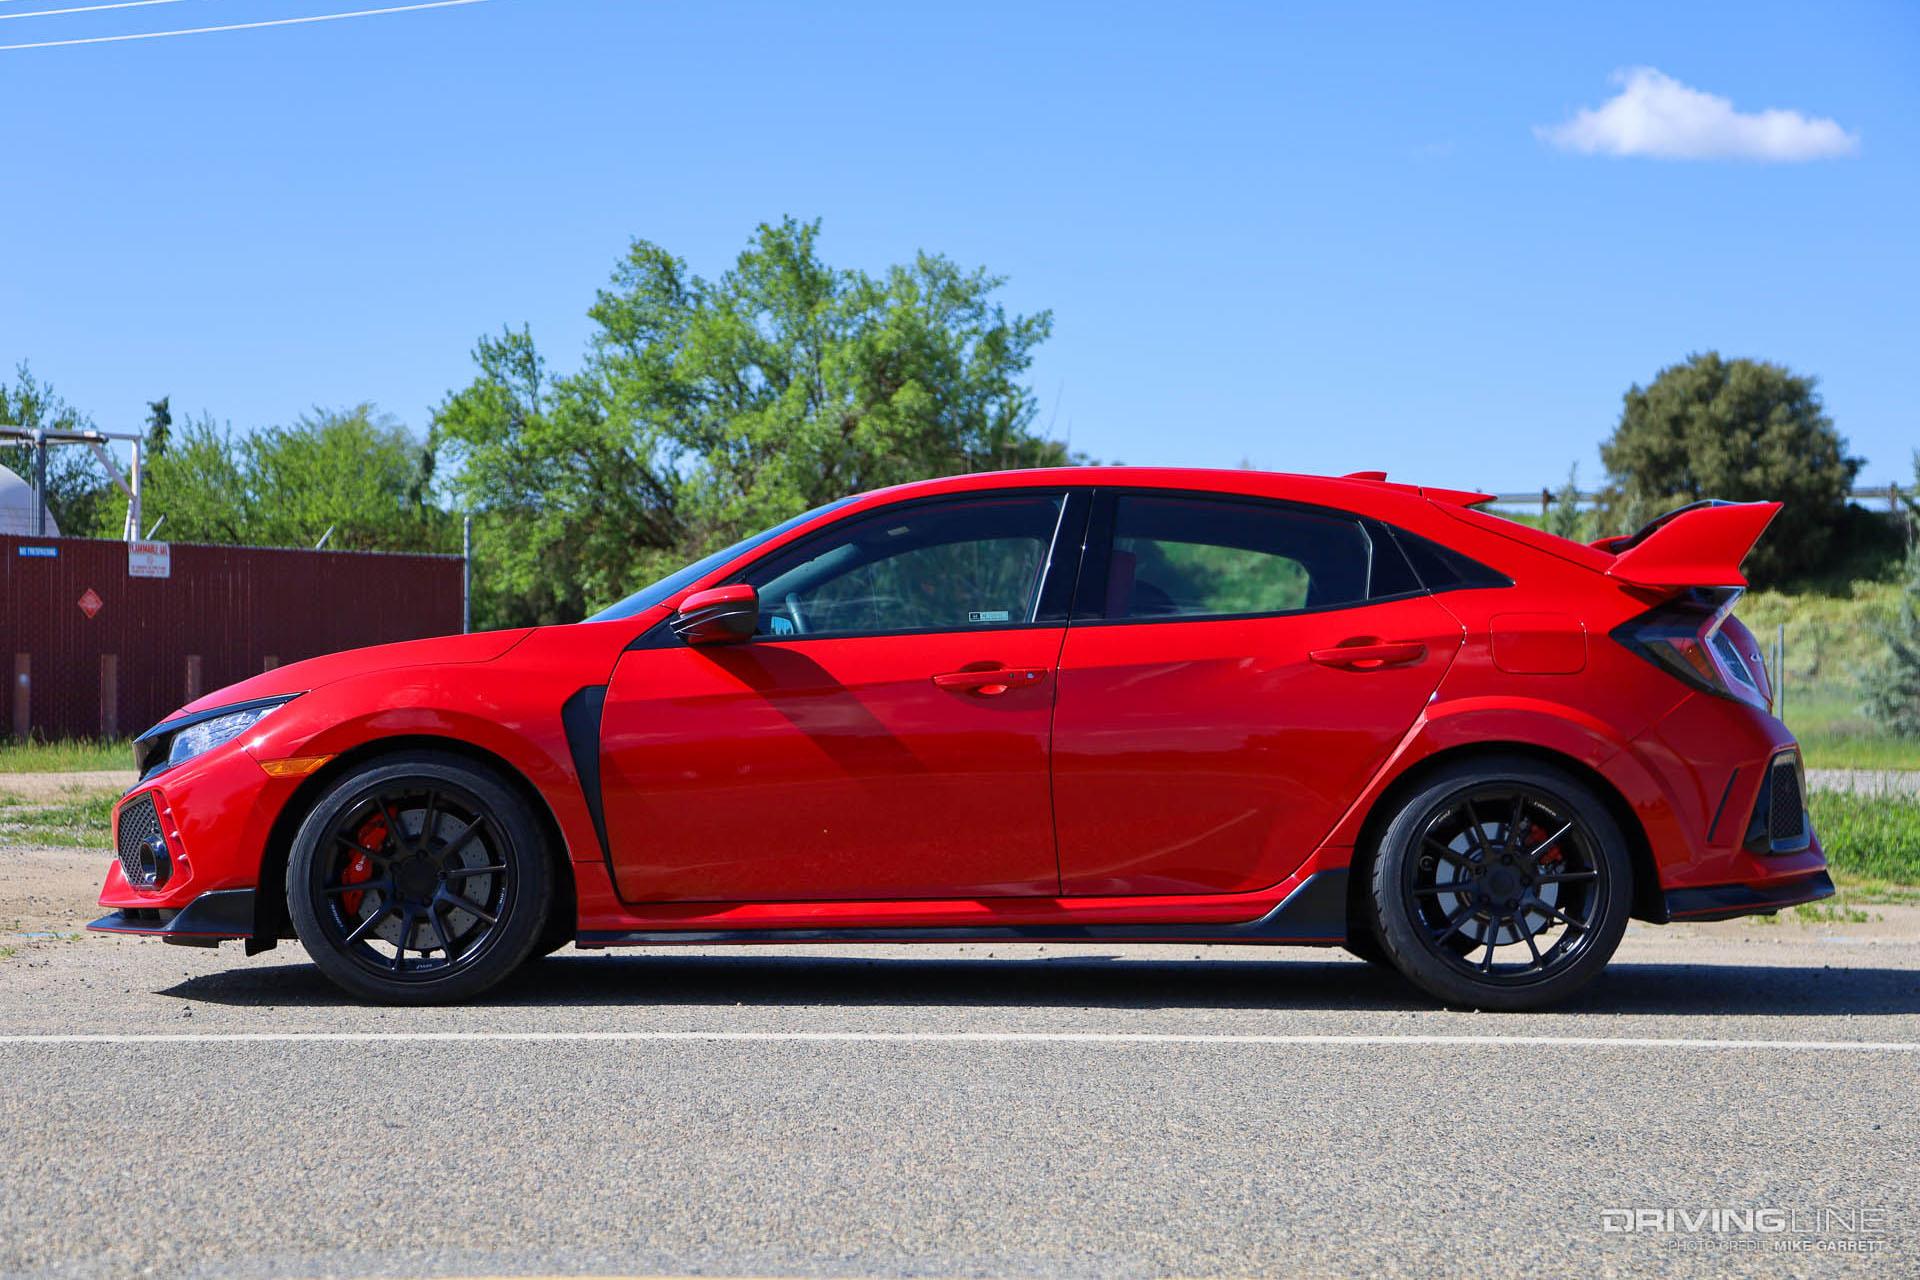 Civic Type R 18 Nt05 Tire And Titan 7 Wheel Swap Drivingline